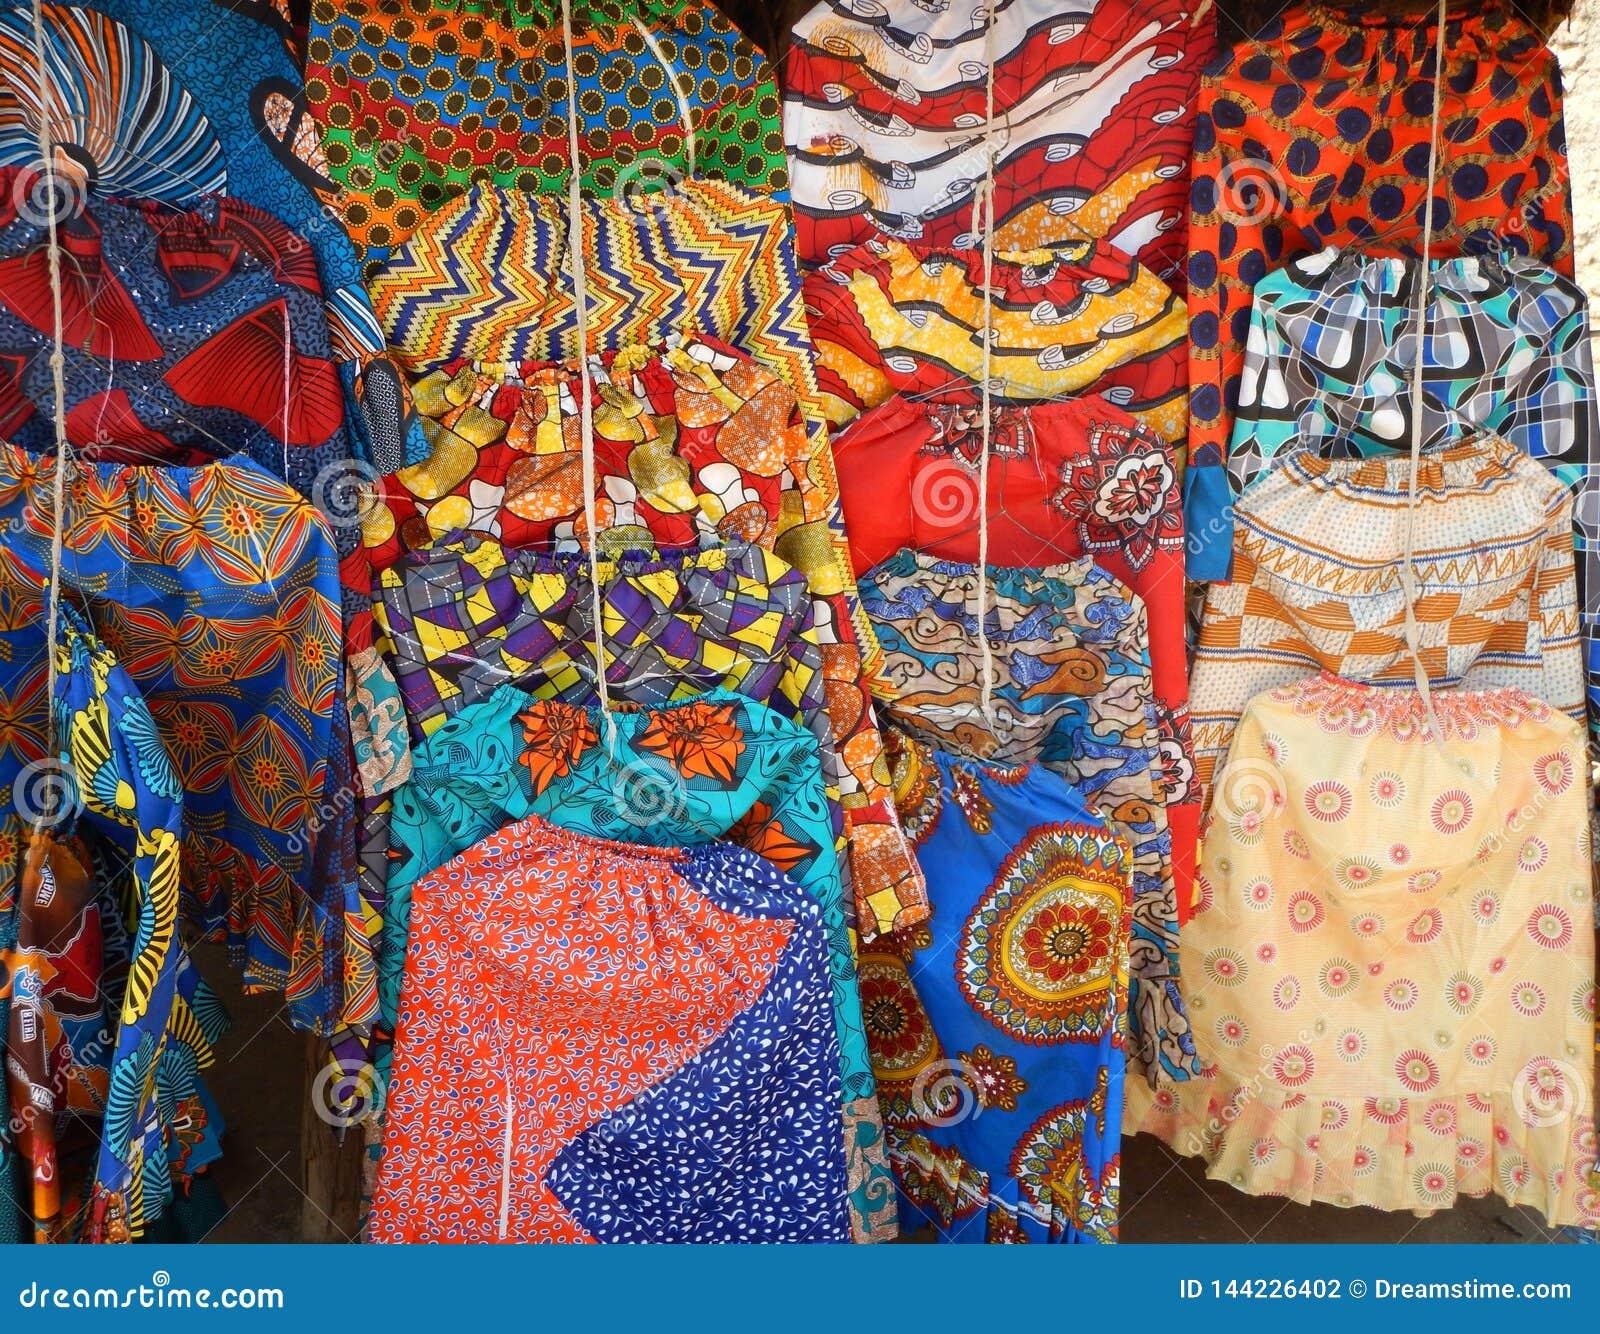 Helder gekleurde en gevormde rokken die in koopvaardijbox hangen